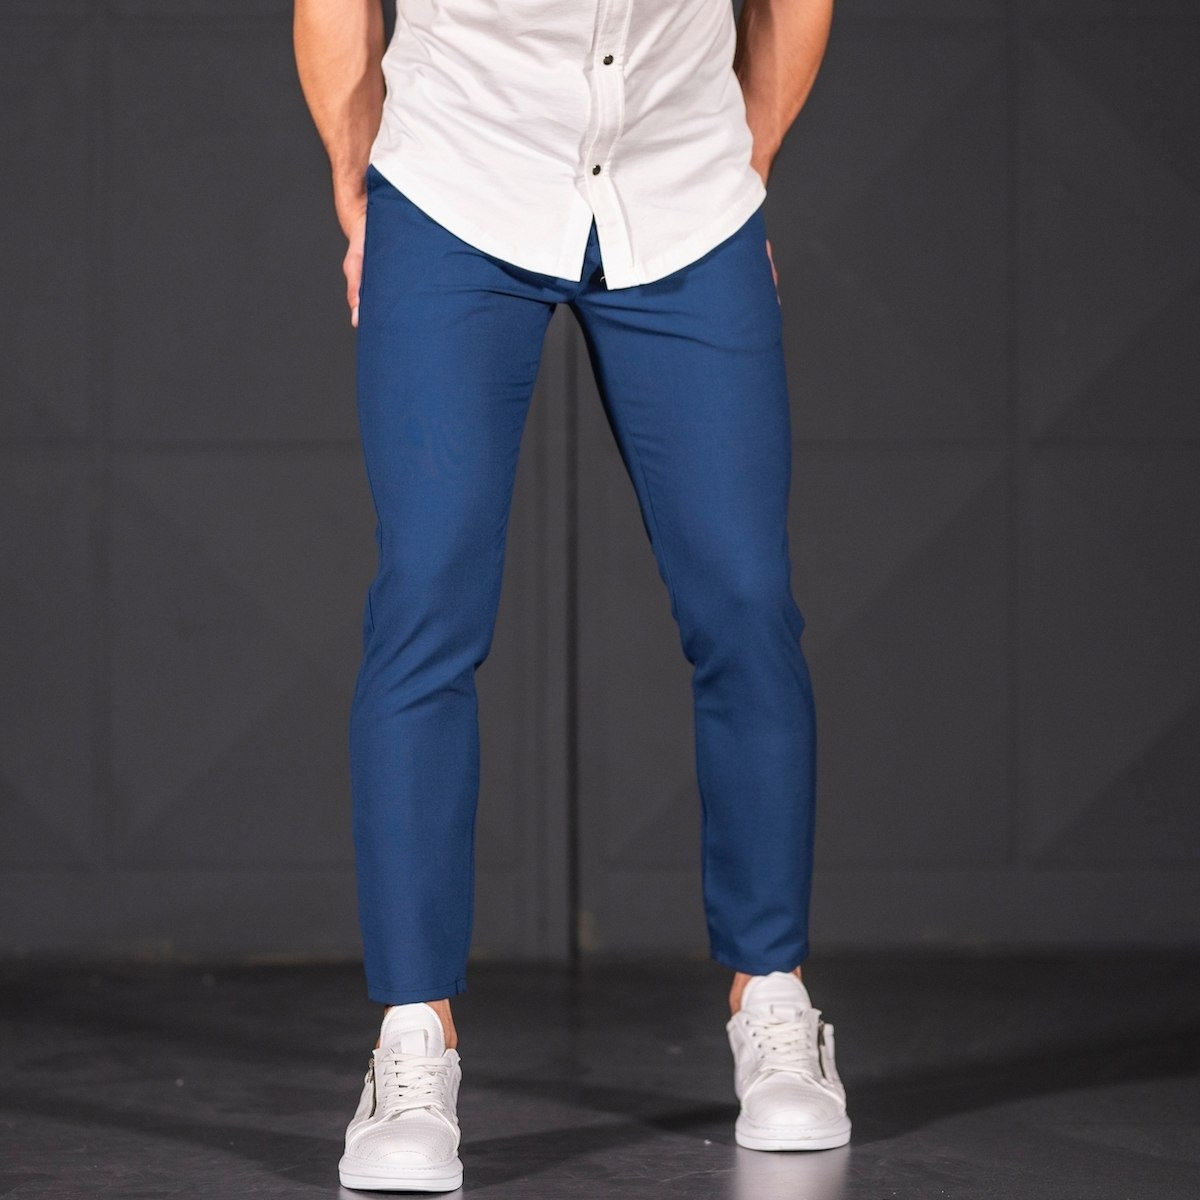 Modern Cut Trousers In Navy Blue Mv Premium Brand - 5